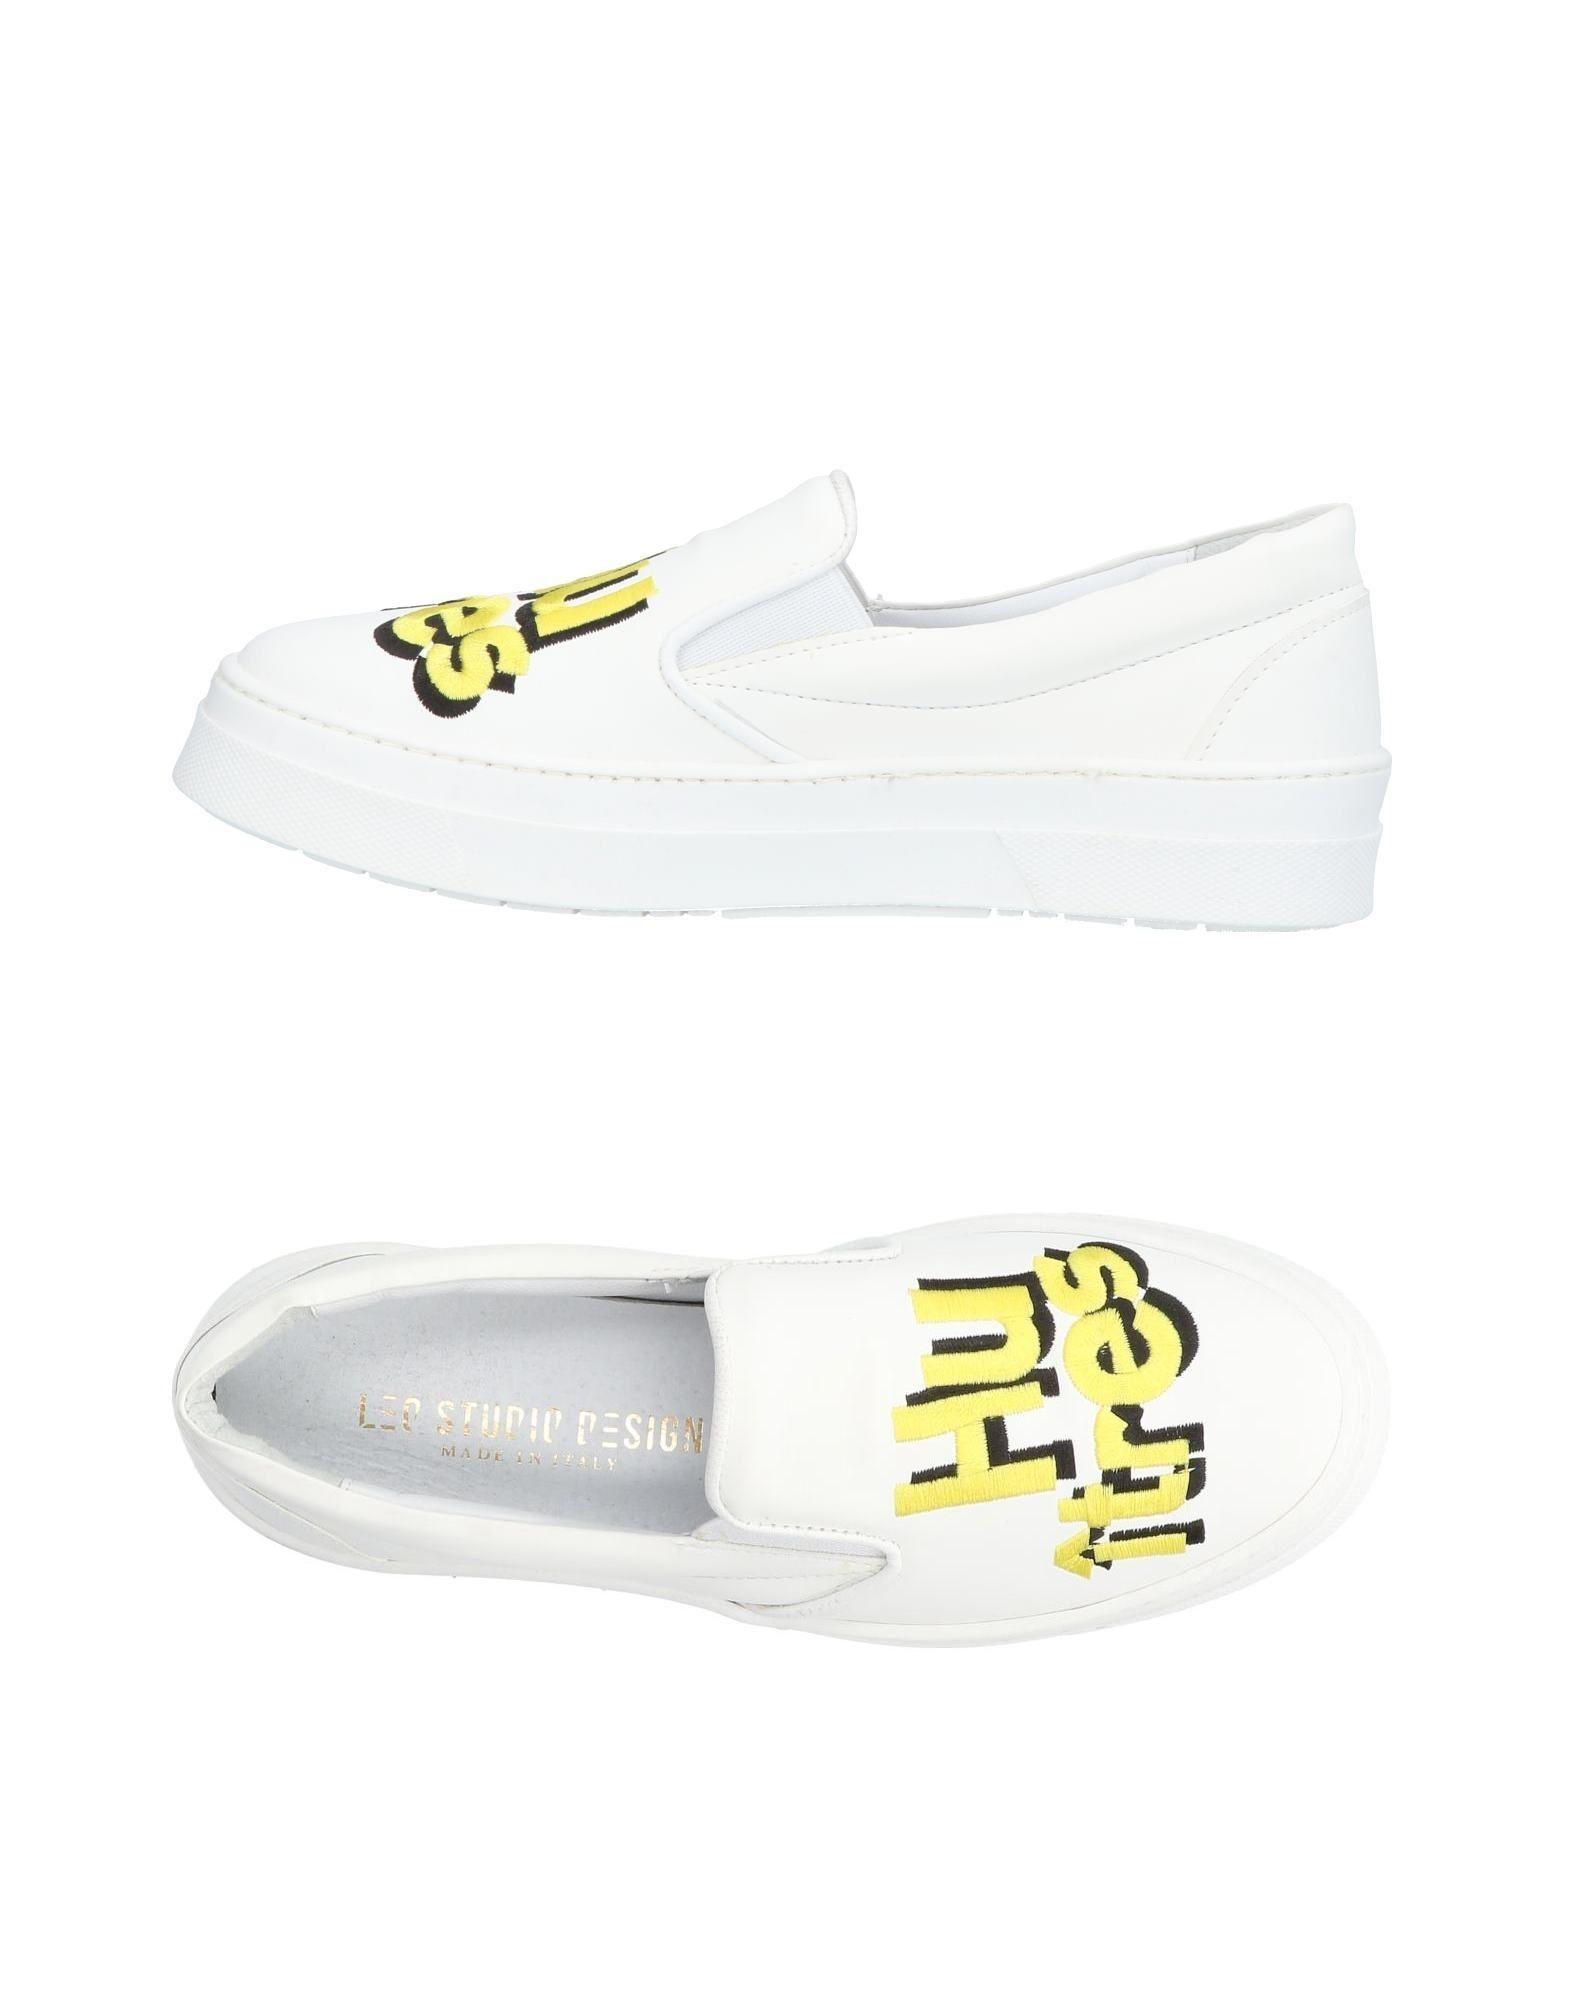 Leo Studio Design Sneakers Damen  11397269DL Gute Qualität beliebte Schuhe